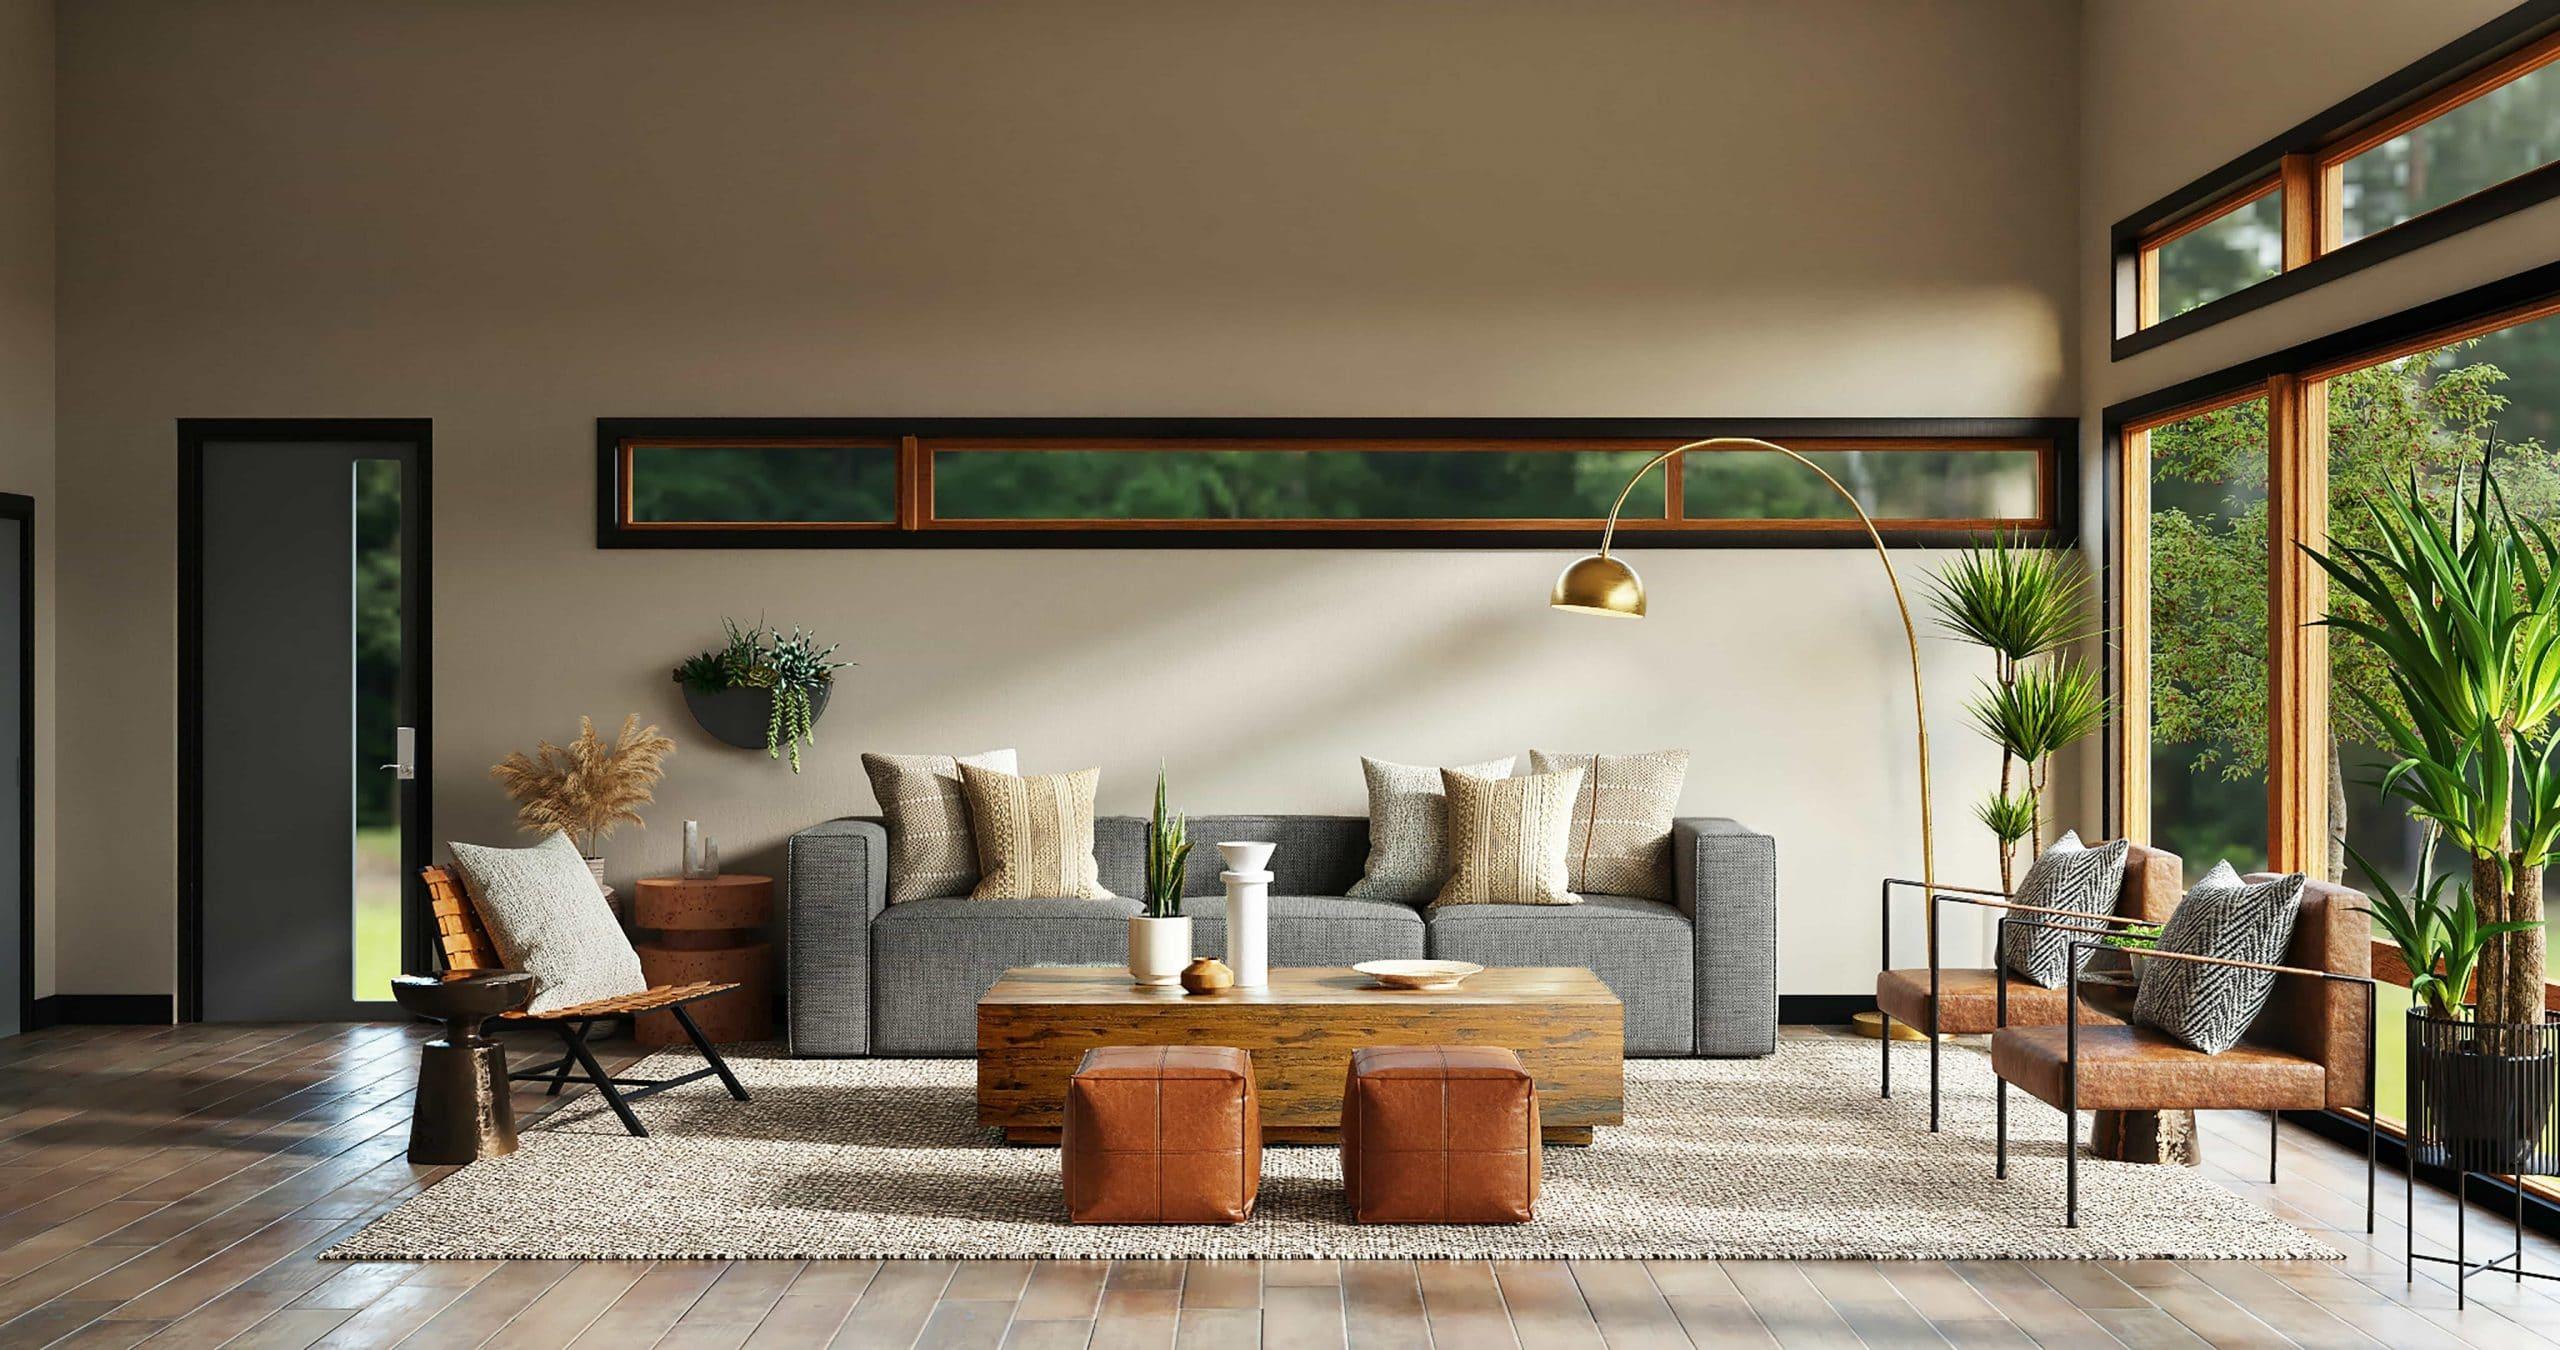 10 ideas de decoración para salones modernos en 2021